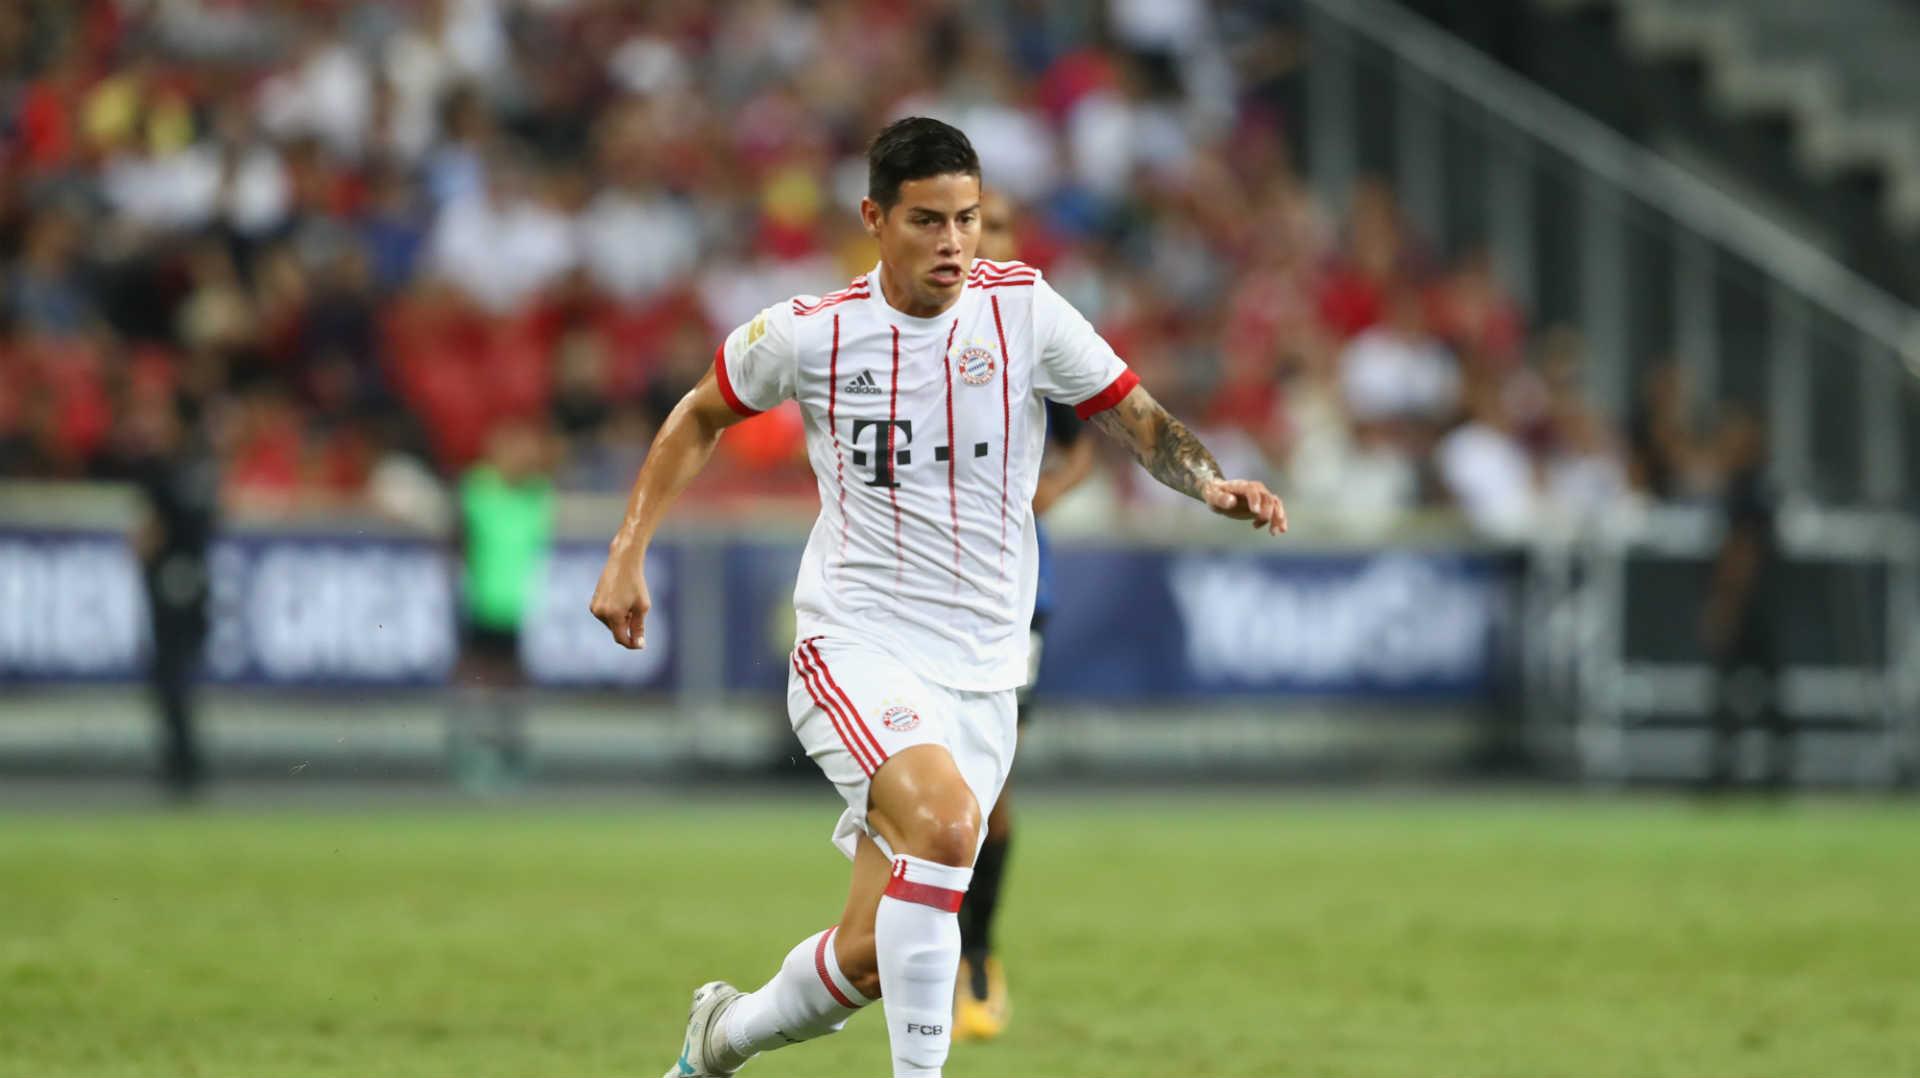 Bayern-Neuzugang James Rodriguez und Frau Daniela Ospina geschieden